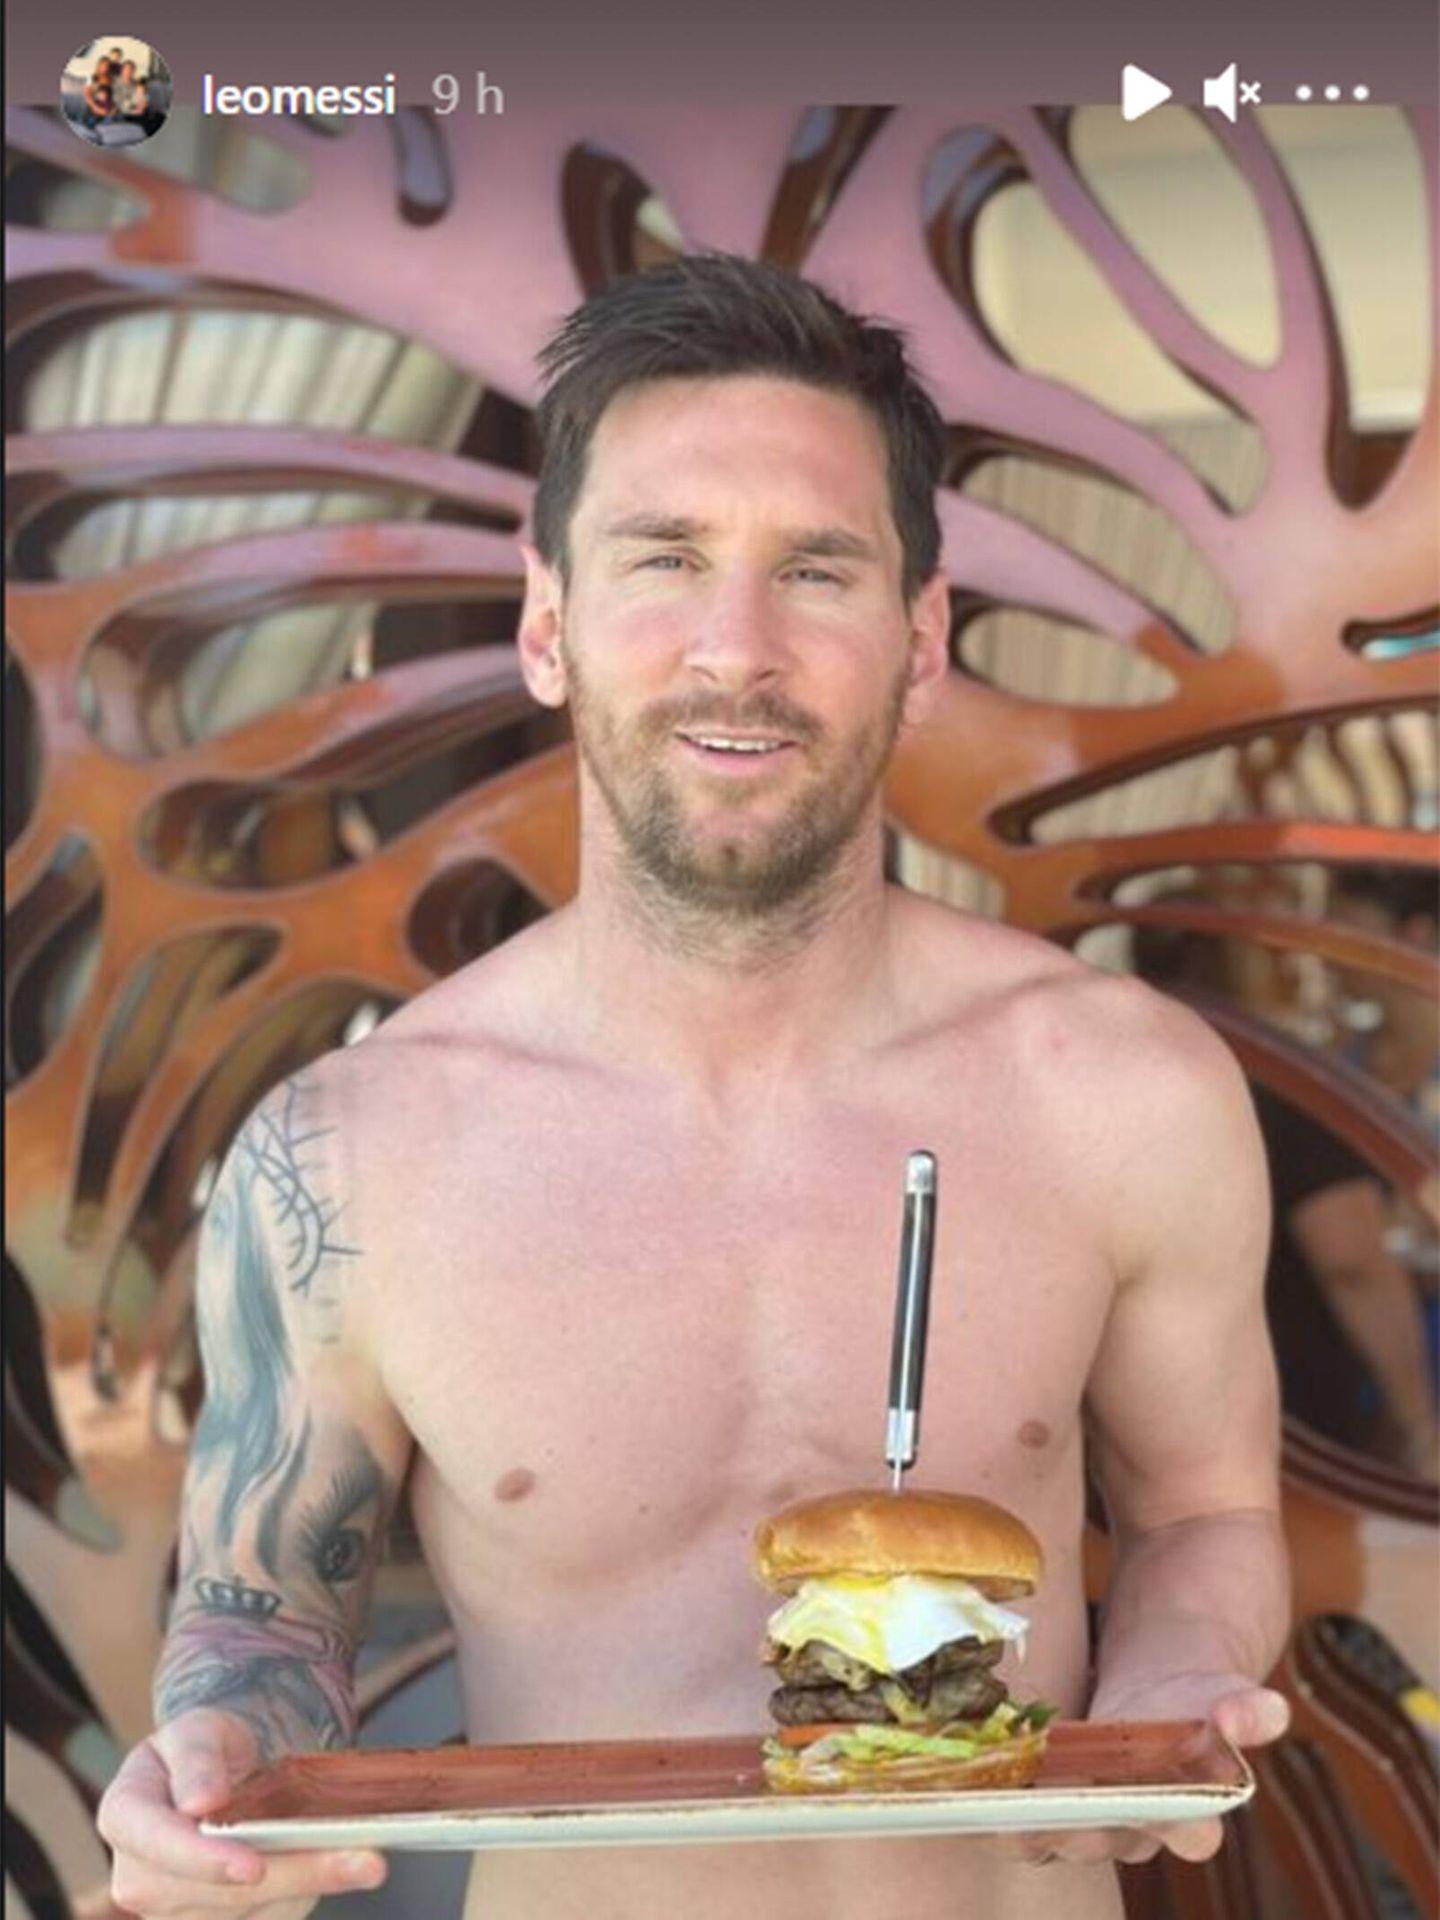 Leo Messi disfruta de sus vacaciones en el Guitar Hotel de Hard Rock. (Instagram @leomessi)